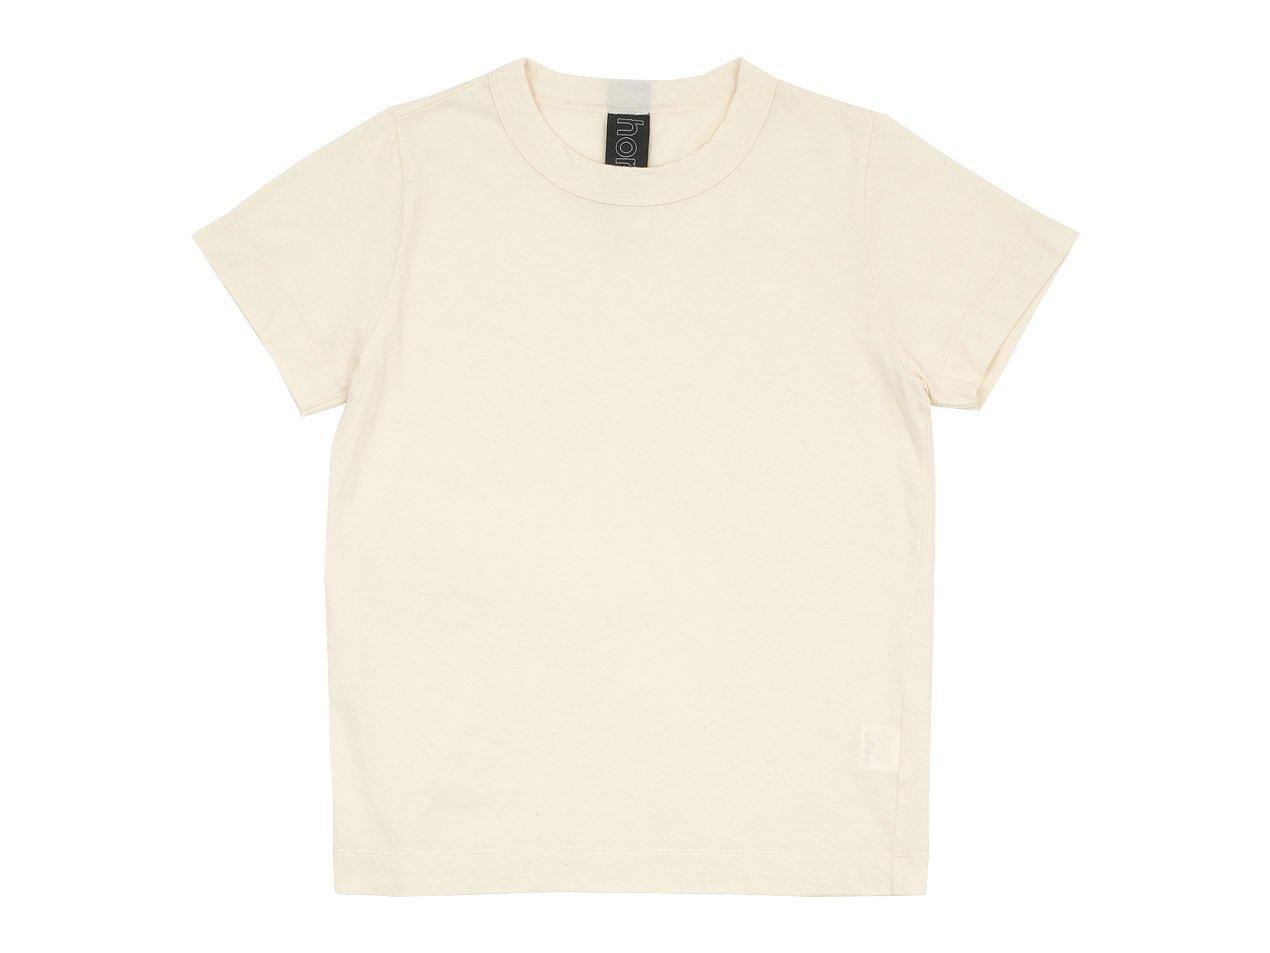 homspun 30/1天竺 半袖Tシャツ